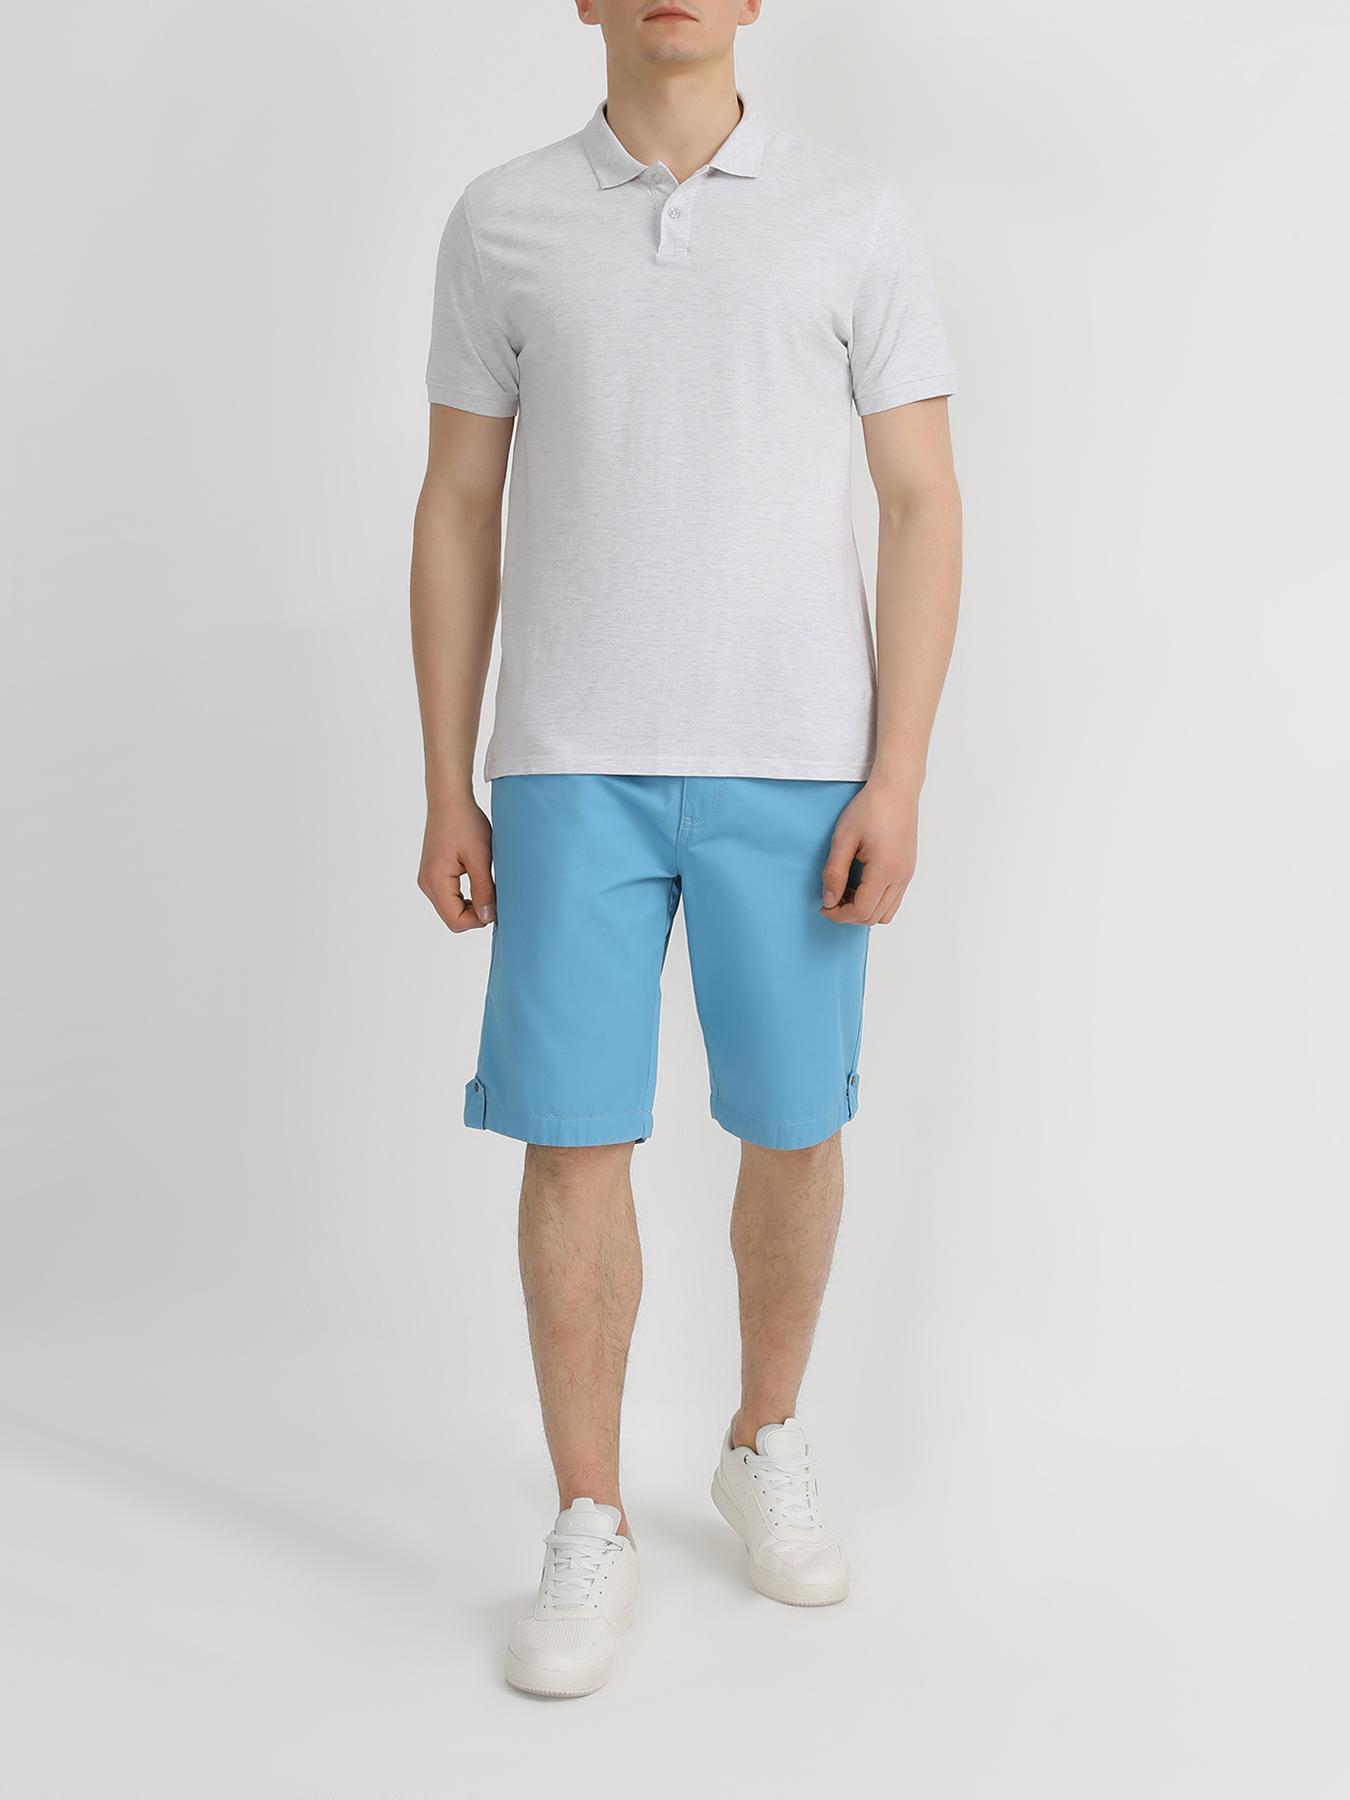 Ritter Jeans Хлопковые шорты фото